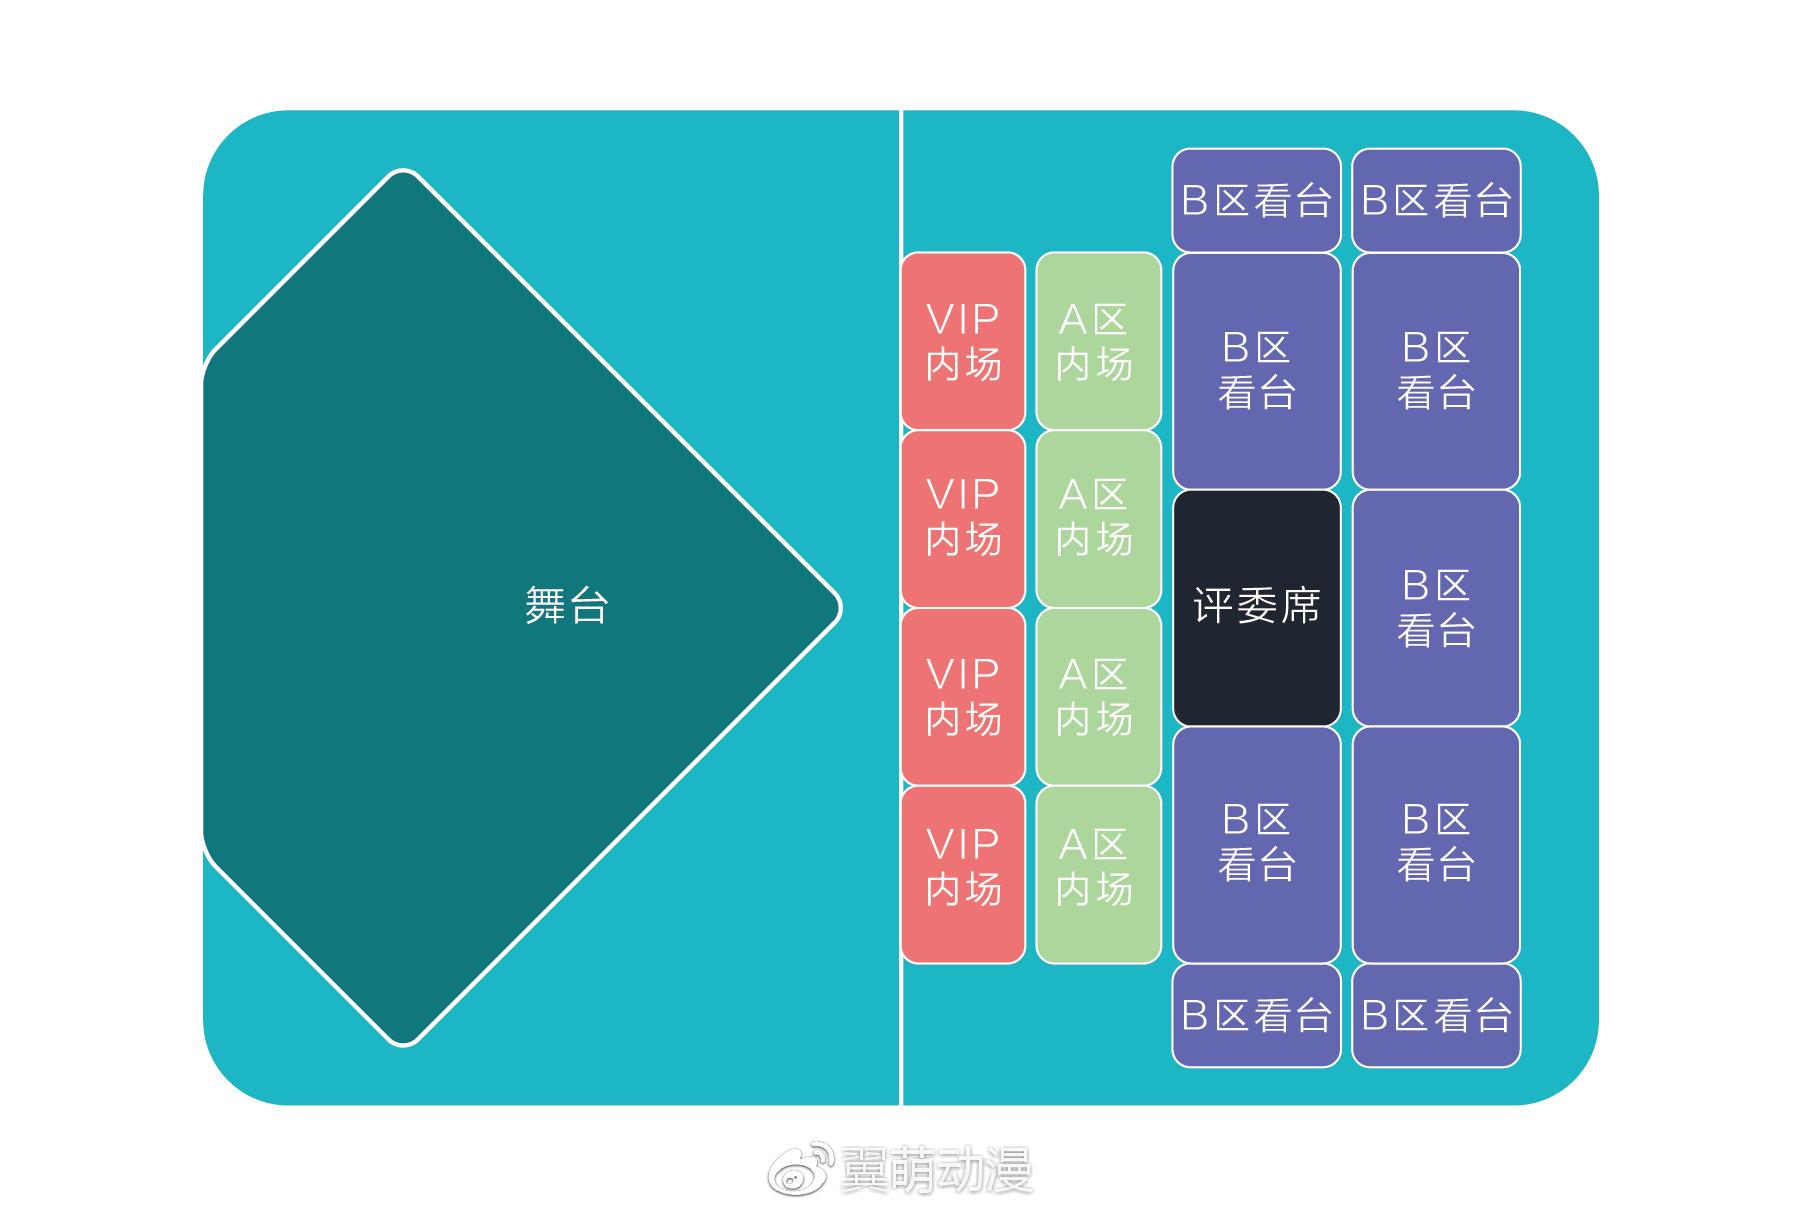 PDM亚洲宅舞大赛终极对决即将开启 选手竟然有她?!-看客路